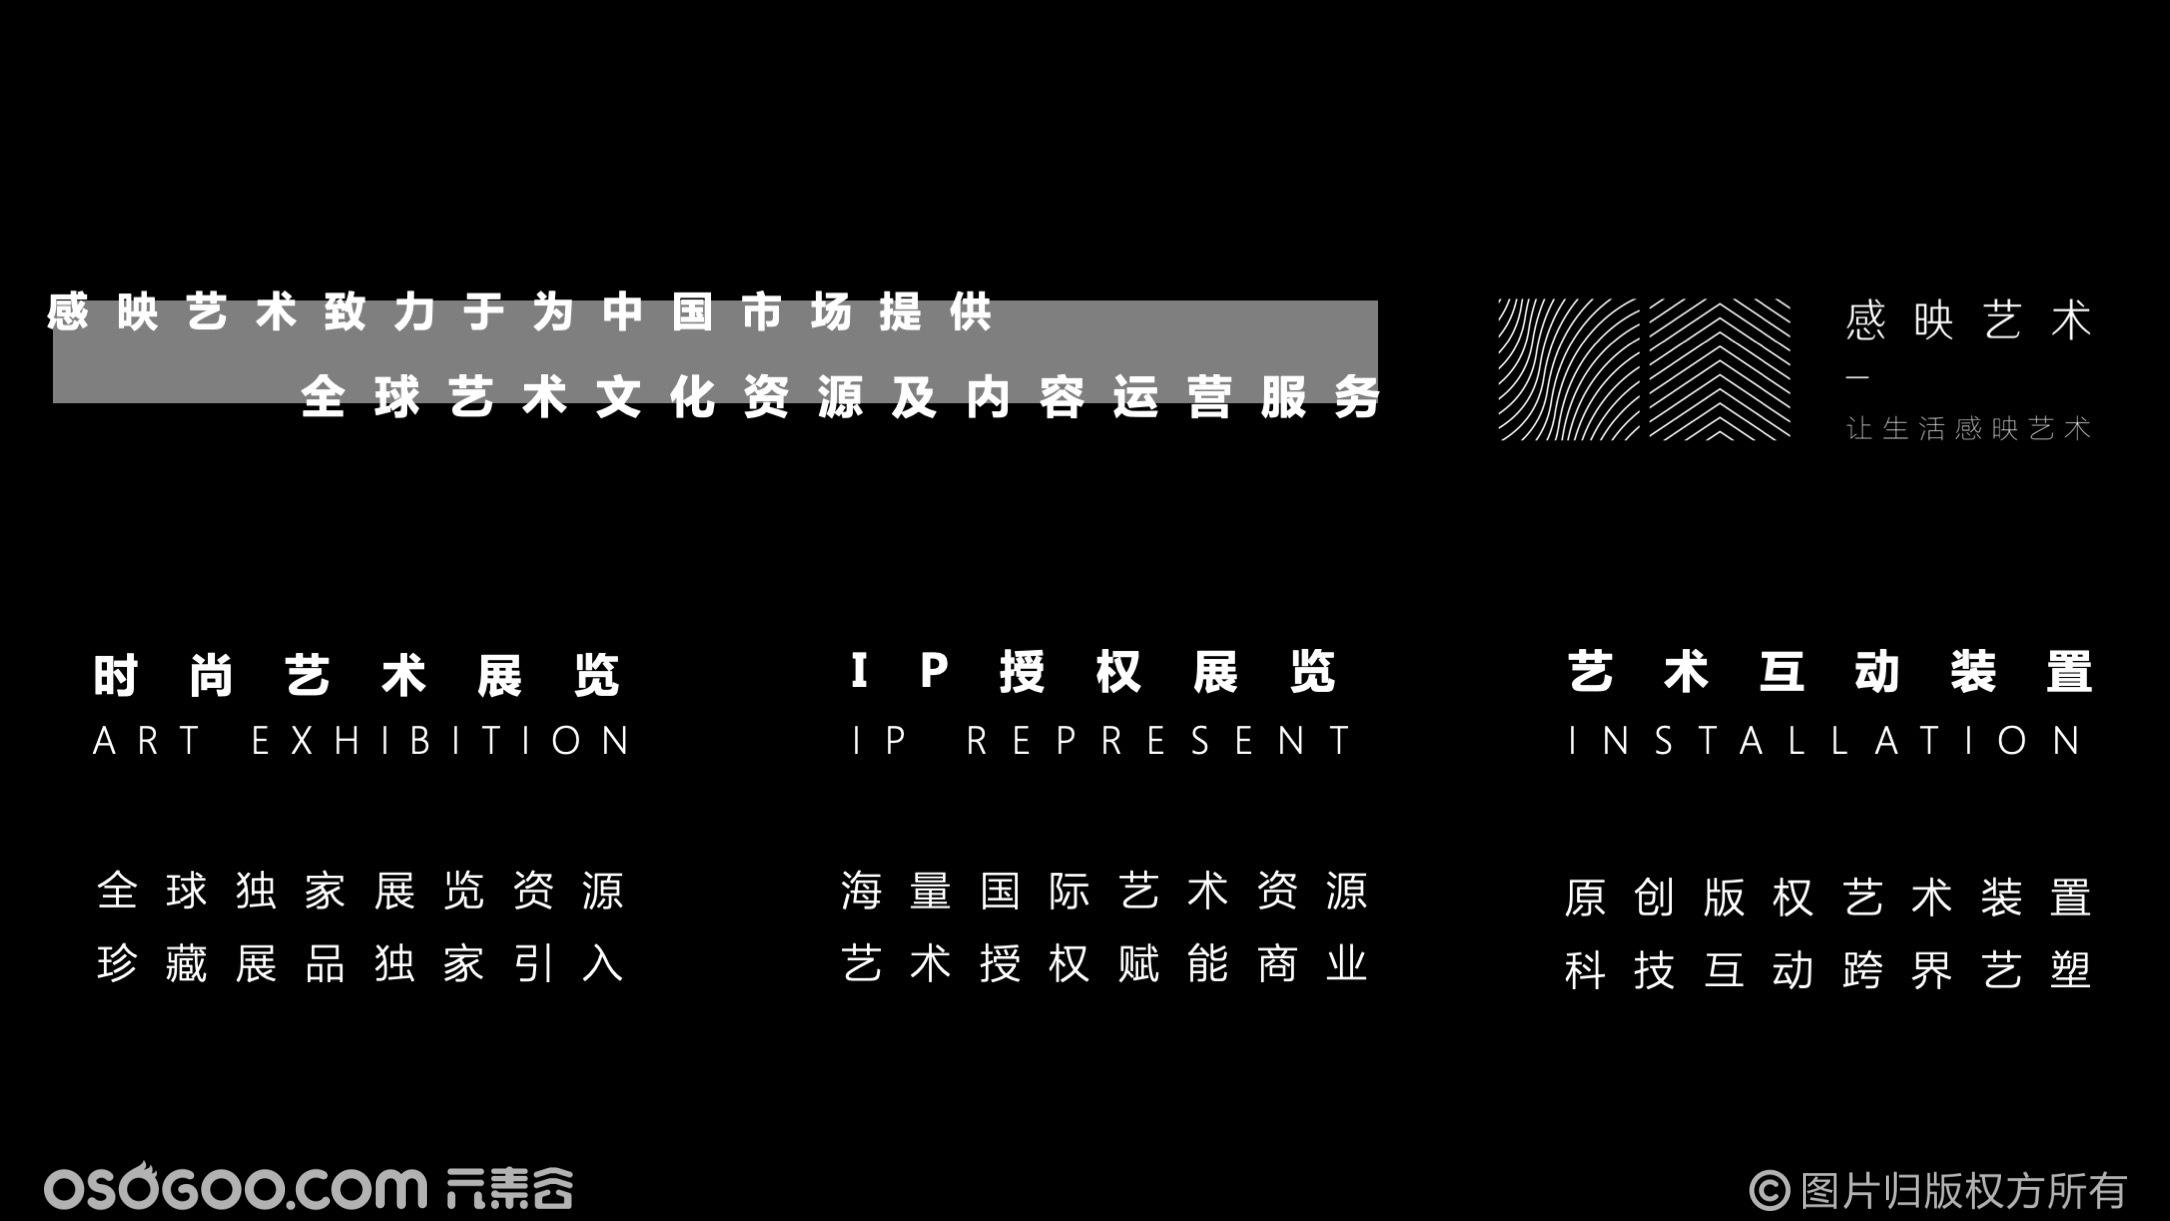 YSL吸烟装经典时尚臻品艺术展【黑白烟色】—感映艺术出品